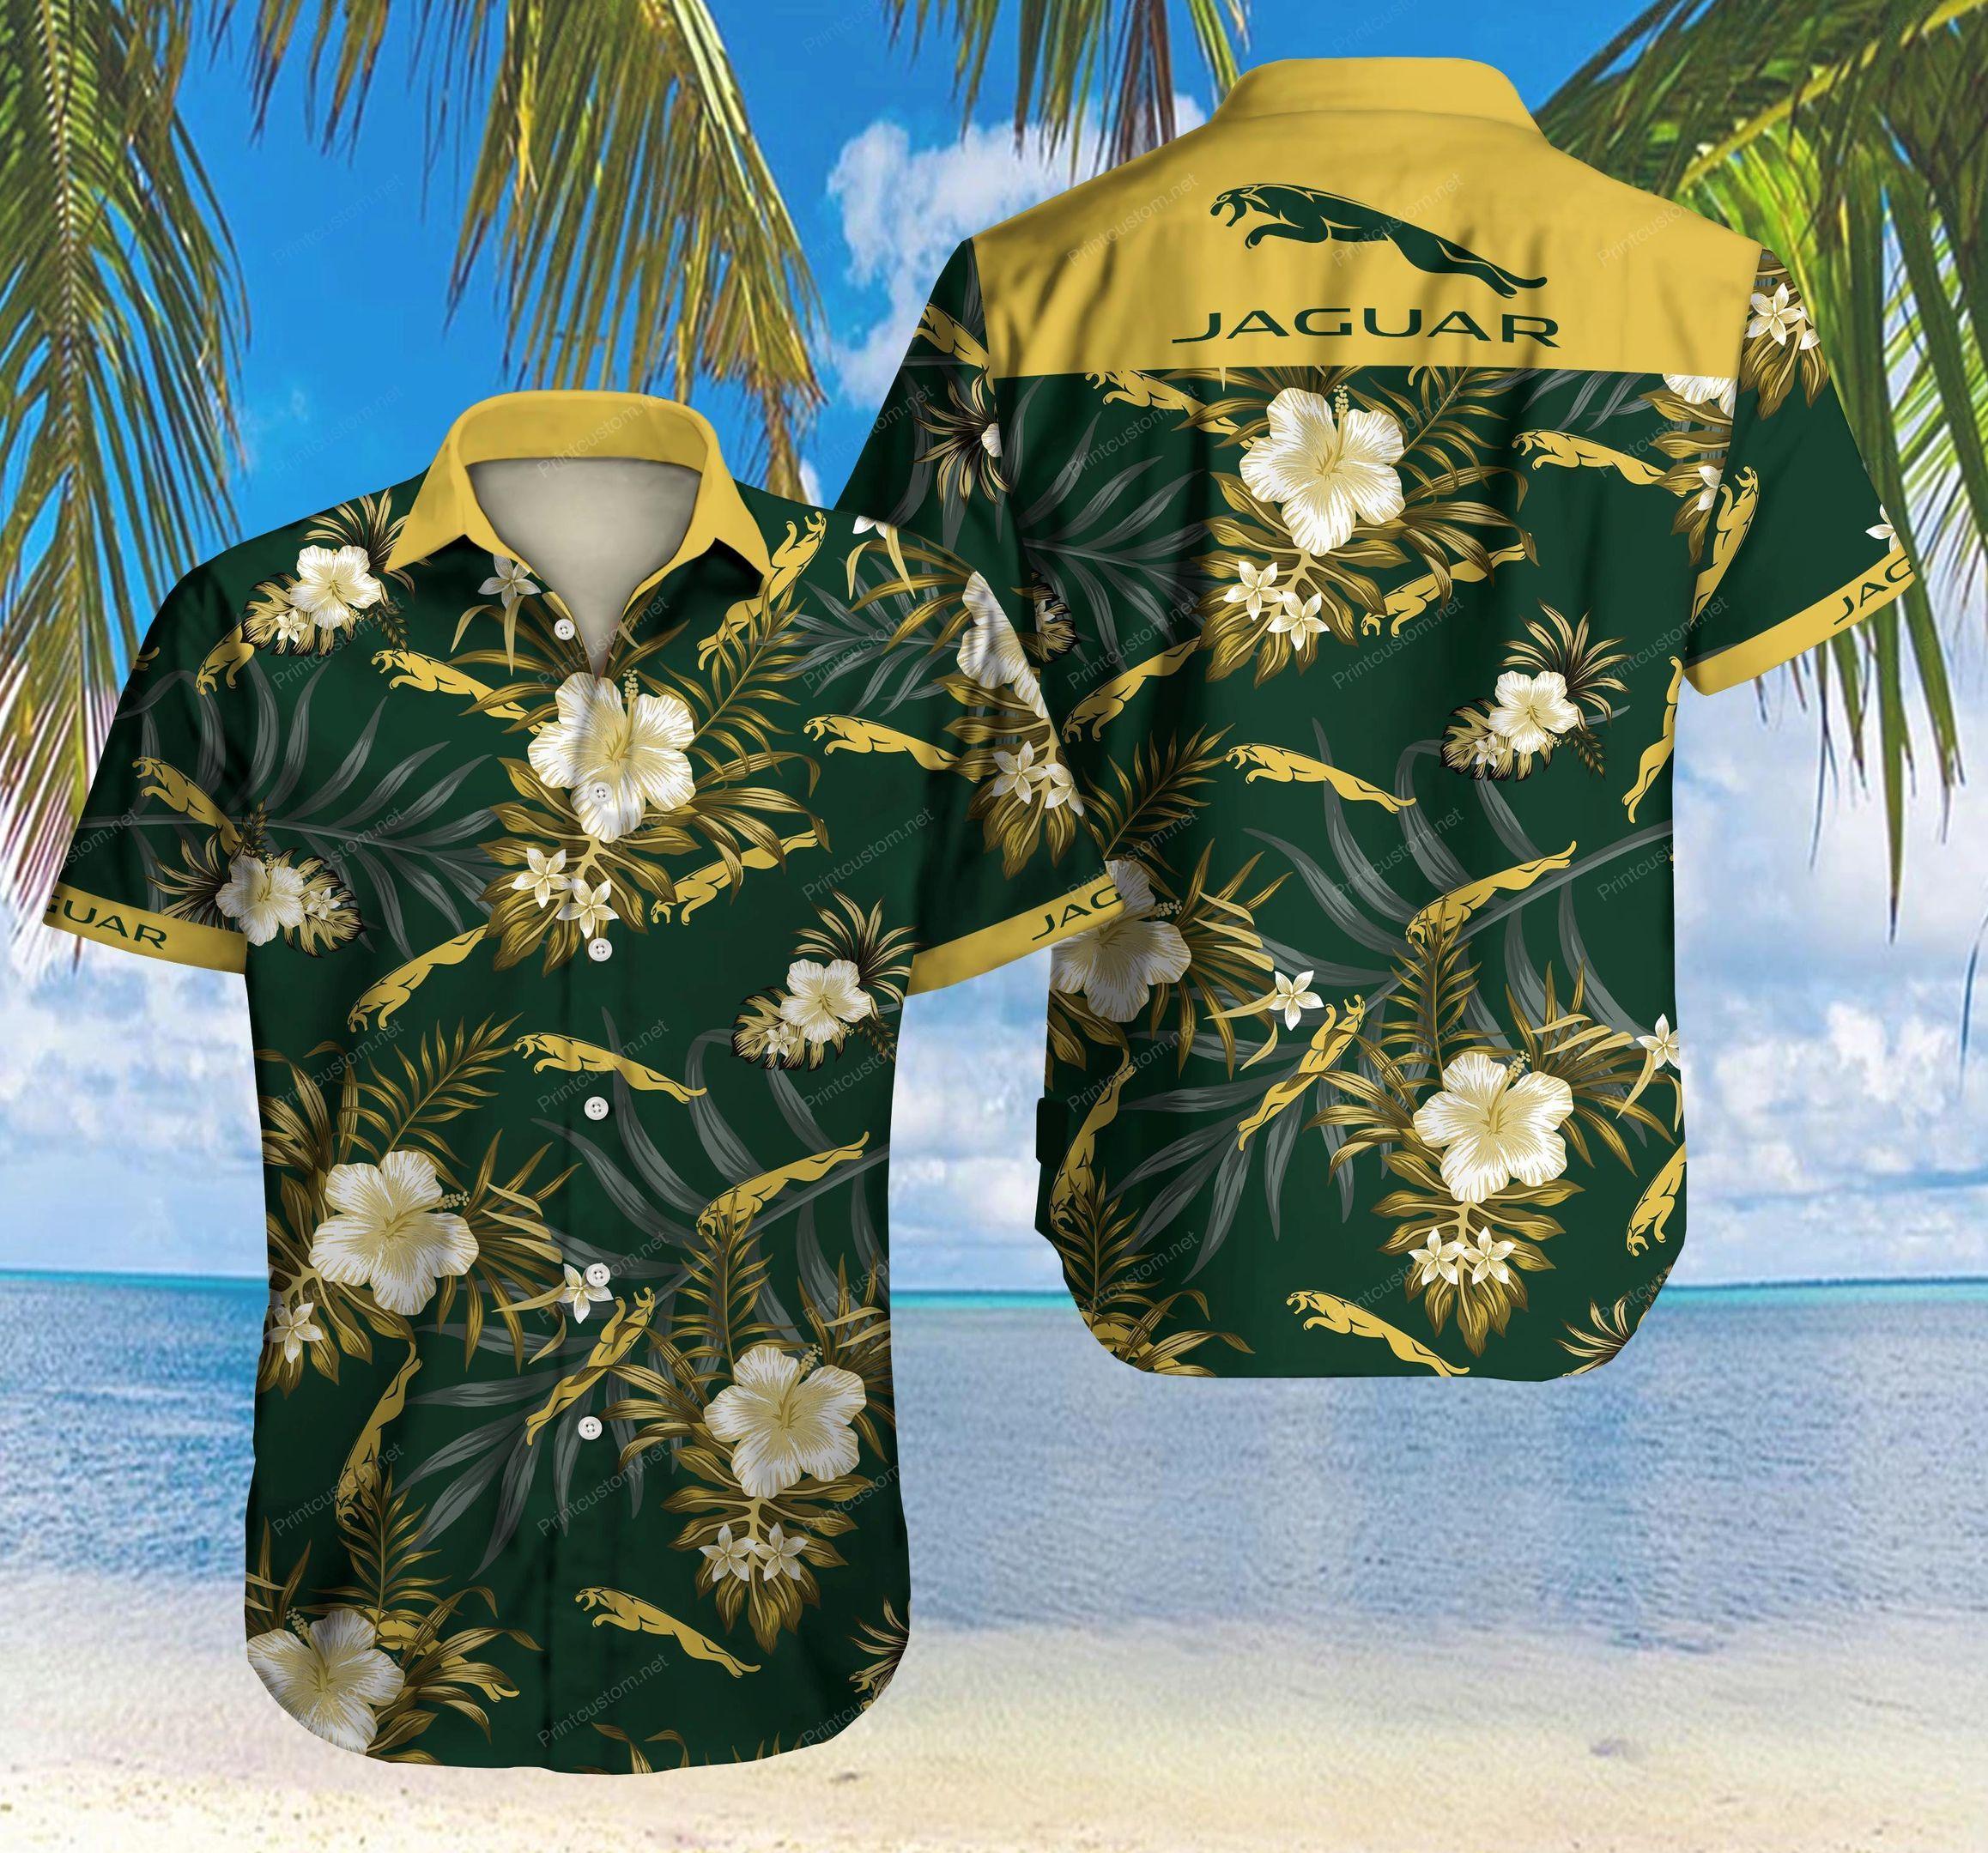 Jaguar Floral Hawaiian Shirt Summer Shirt